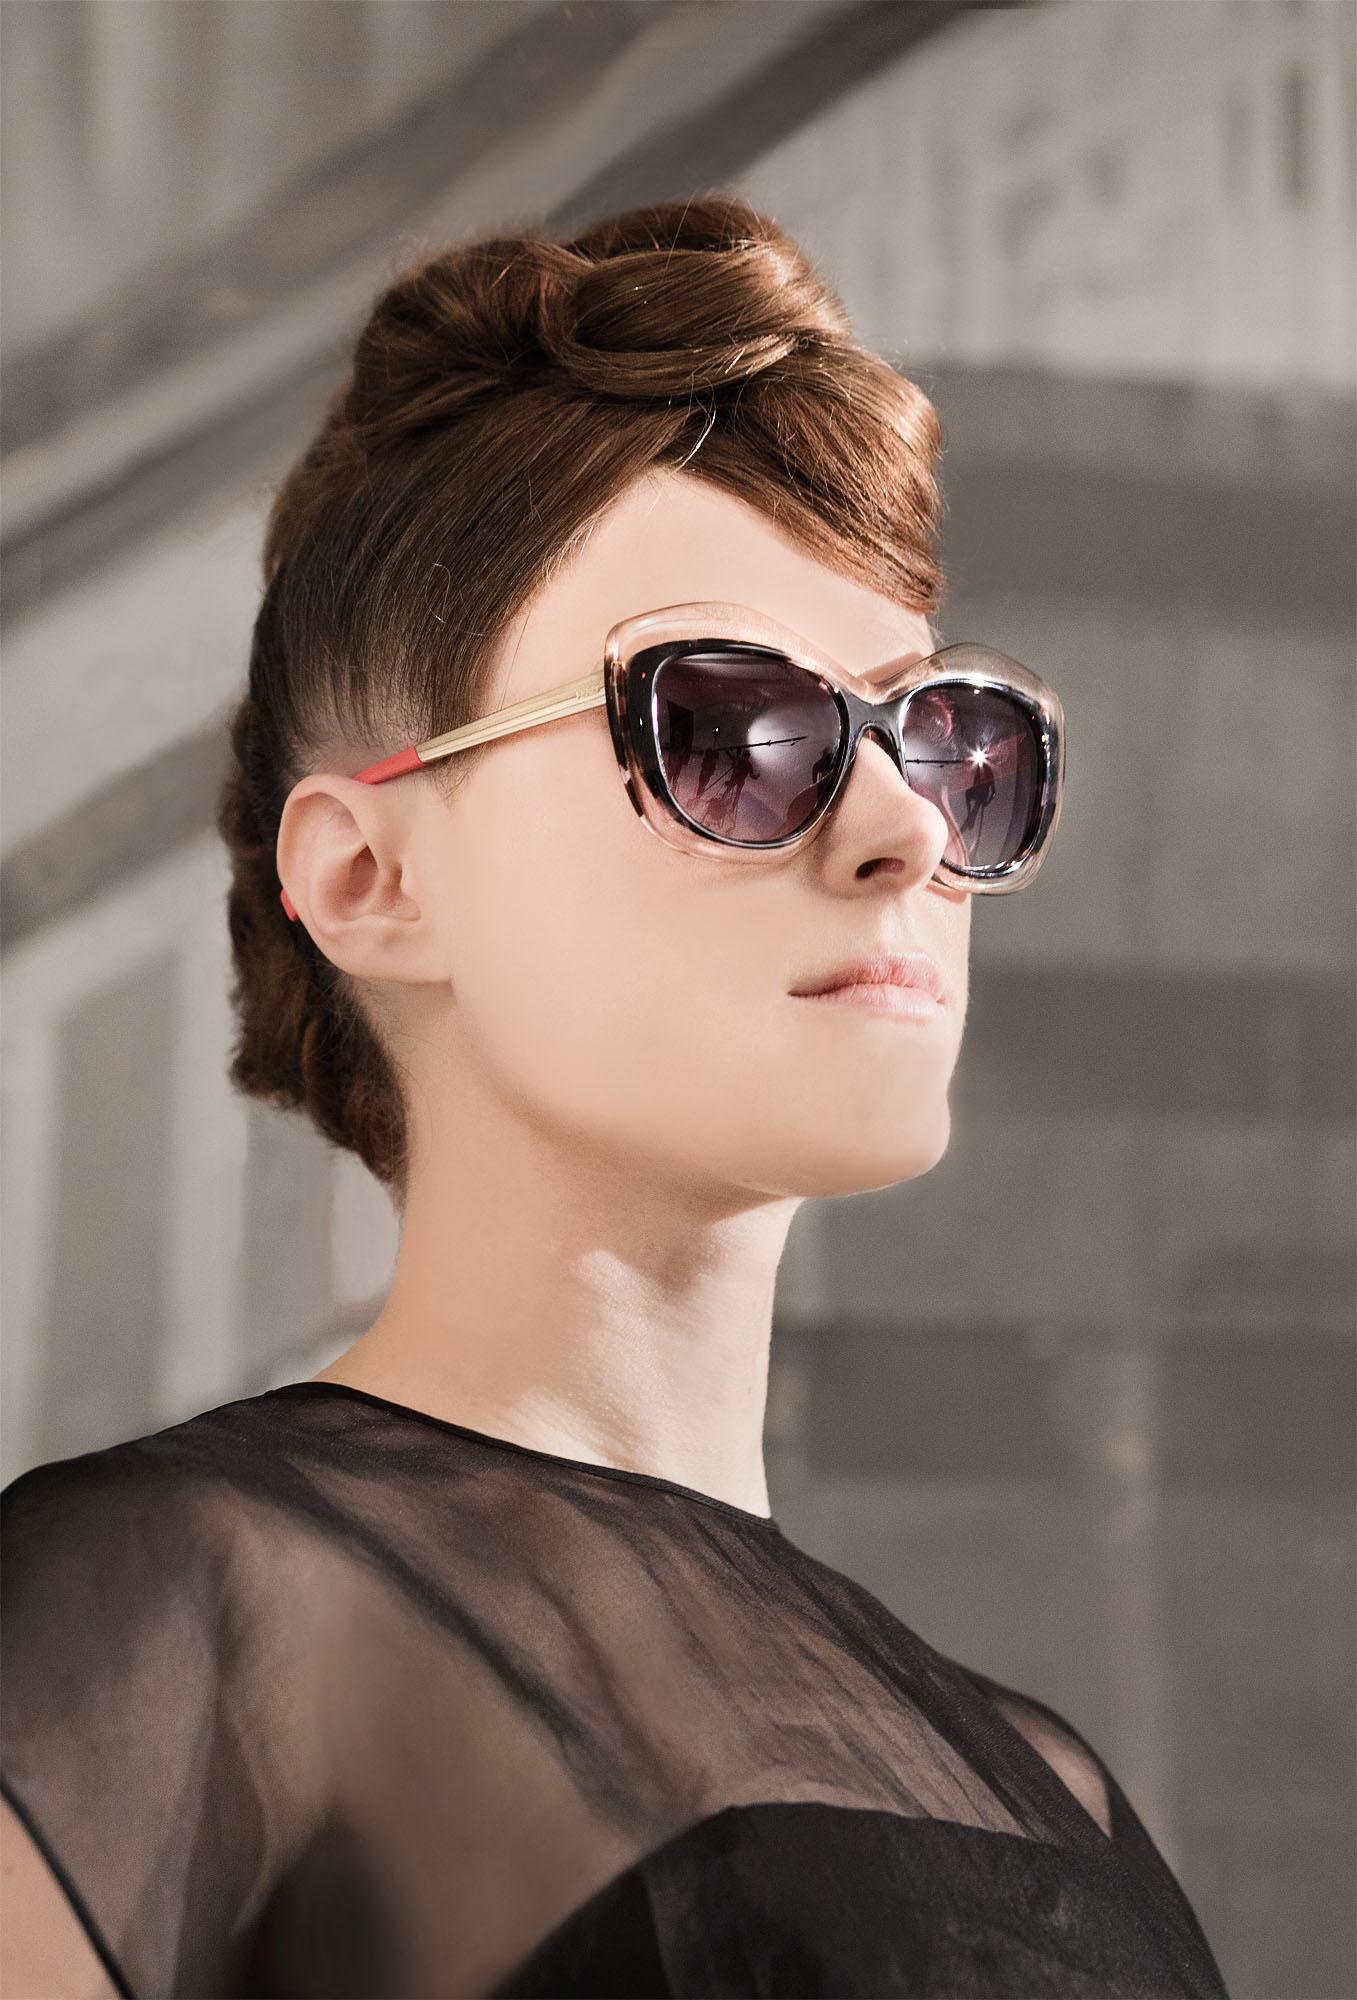 Behind the scenes of singer Kiesza featuring Fendi Color Block sunglasses © Claudio Morelli